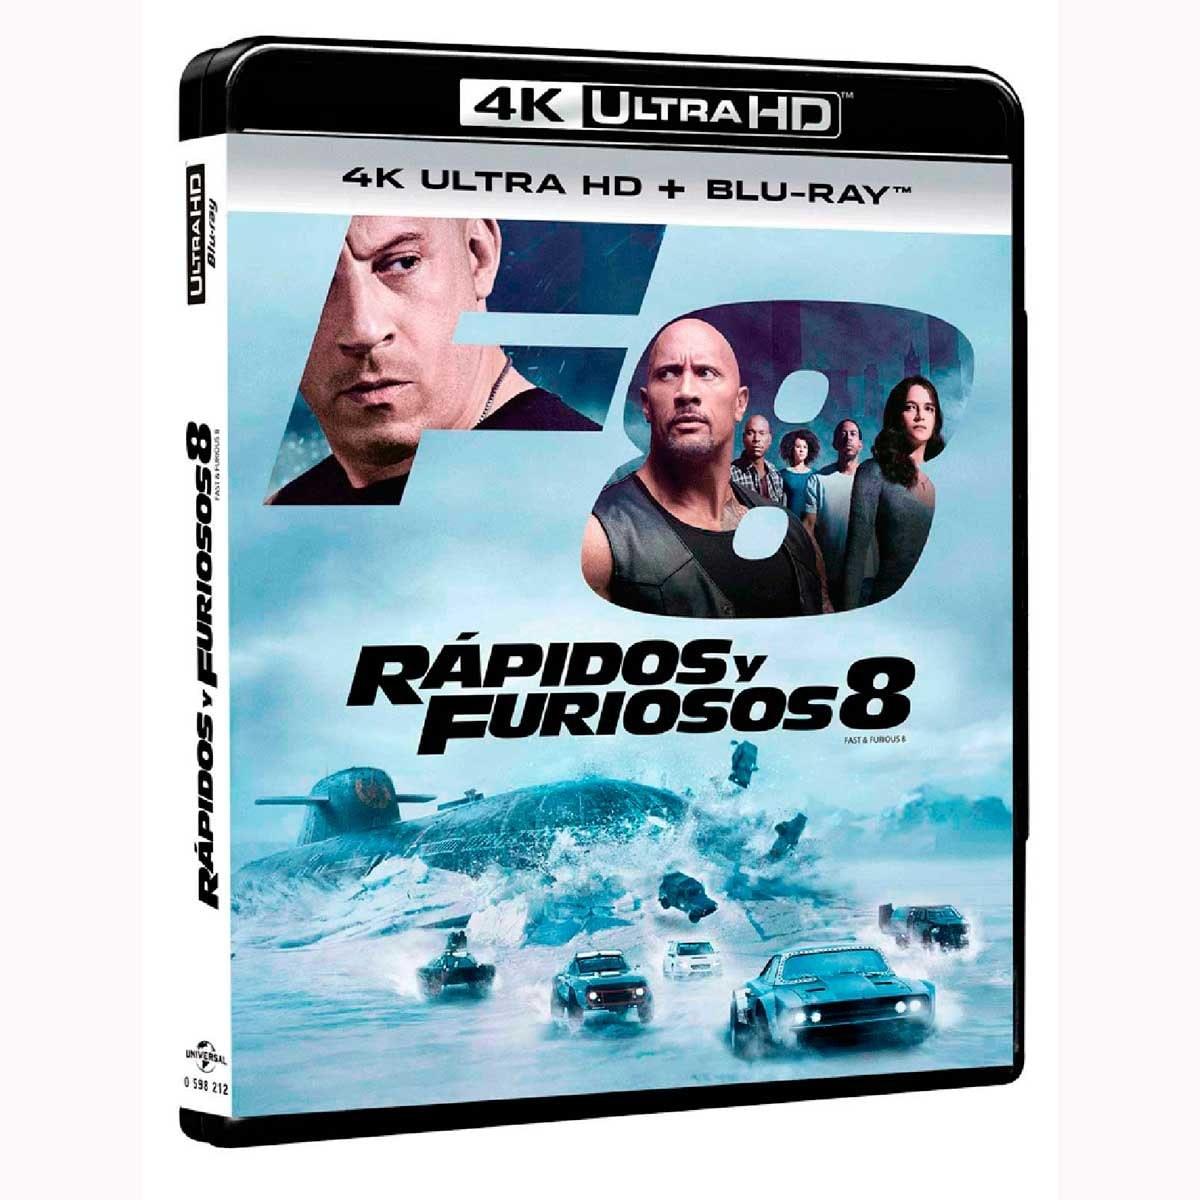 4K Ultra Hd + Blu Ray  Rapidos y Furiosos 8